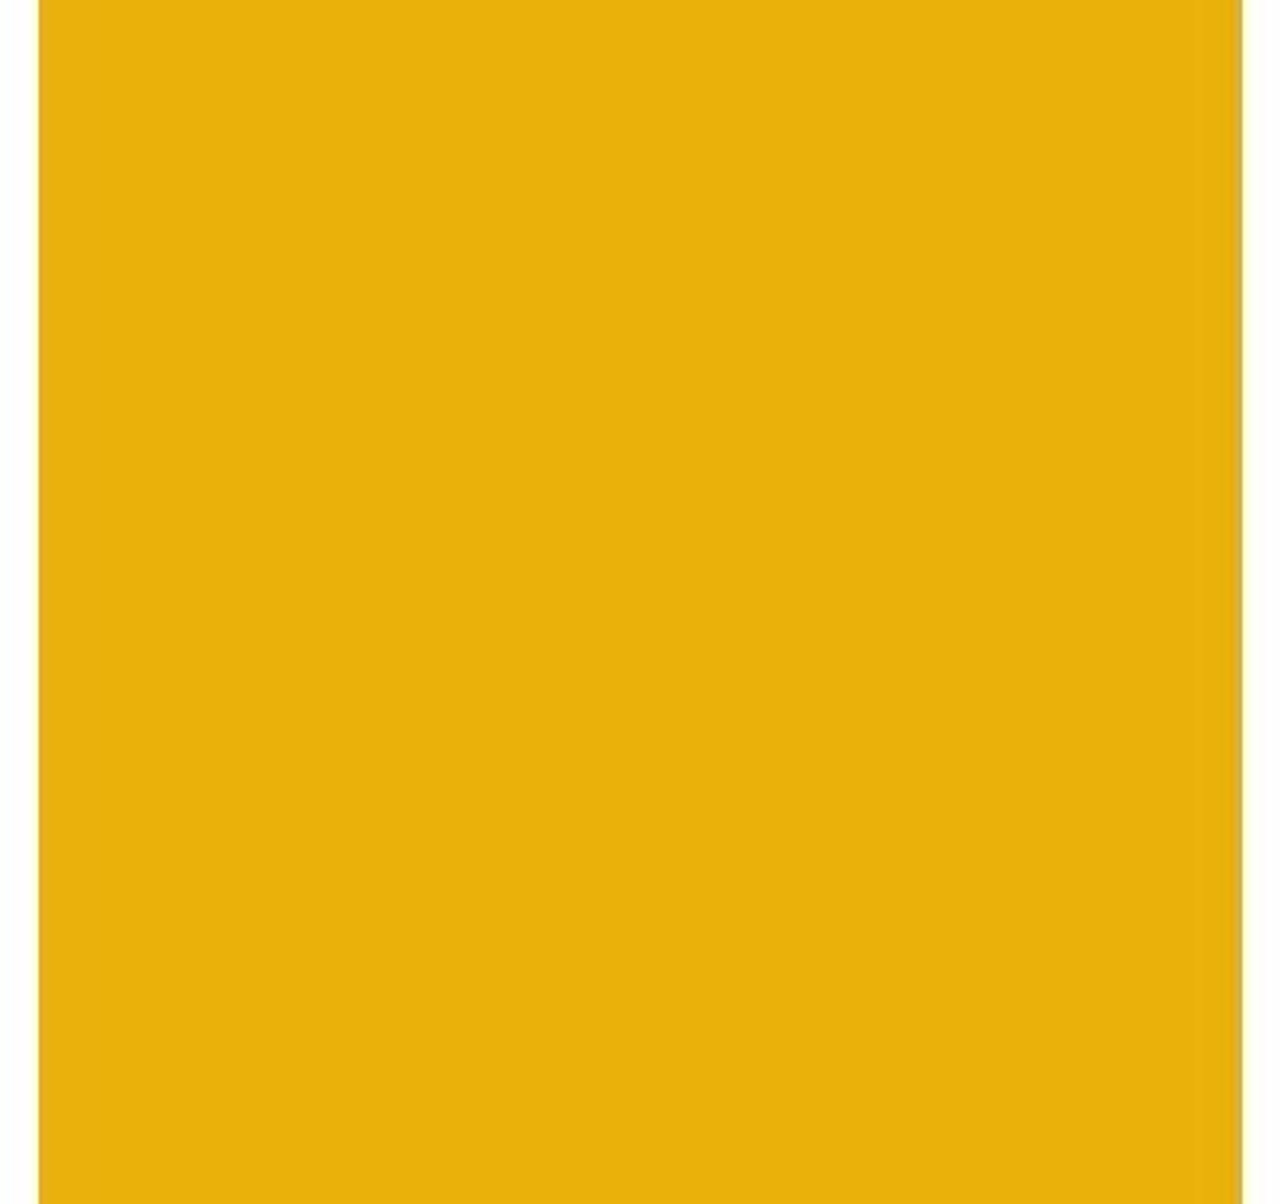 "#2003 Rosco Gels Roscolux Storaro Yellow, 20x24"""